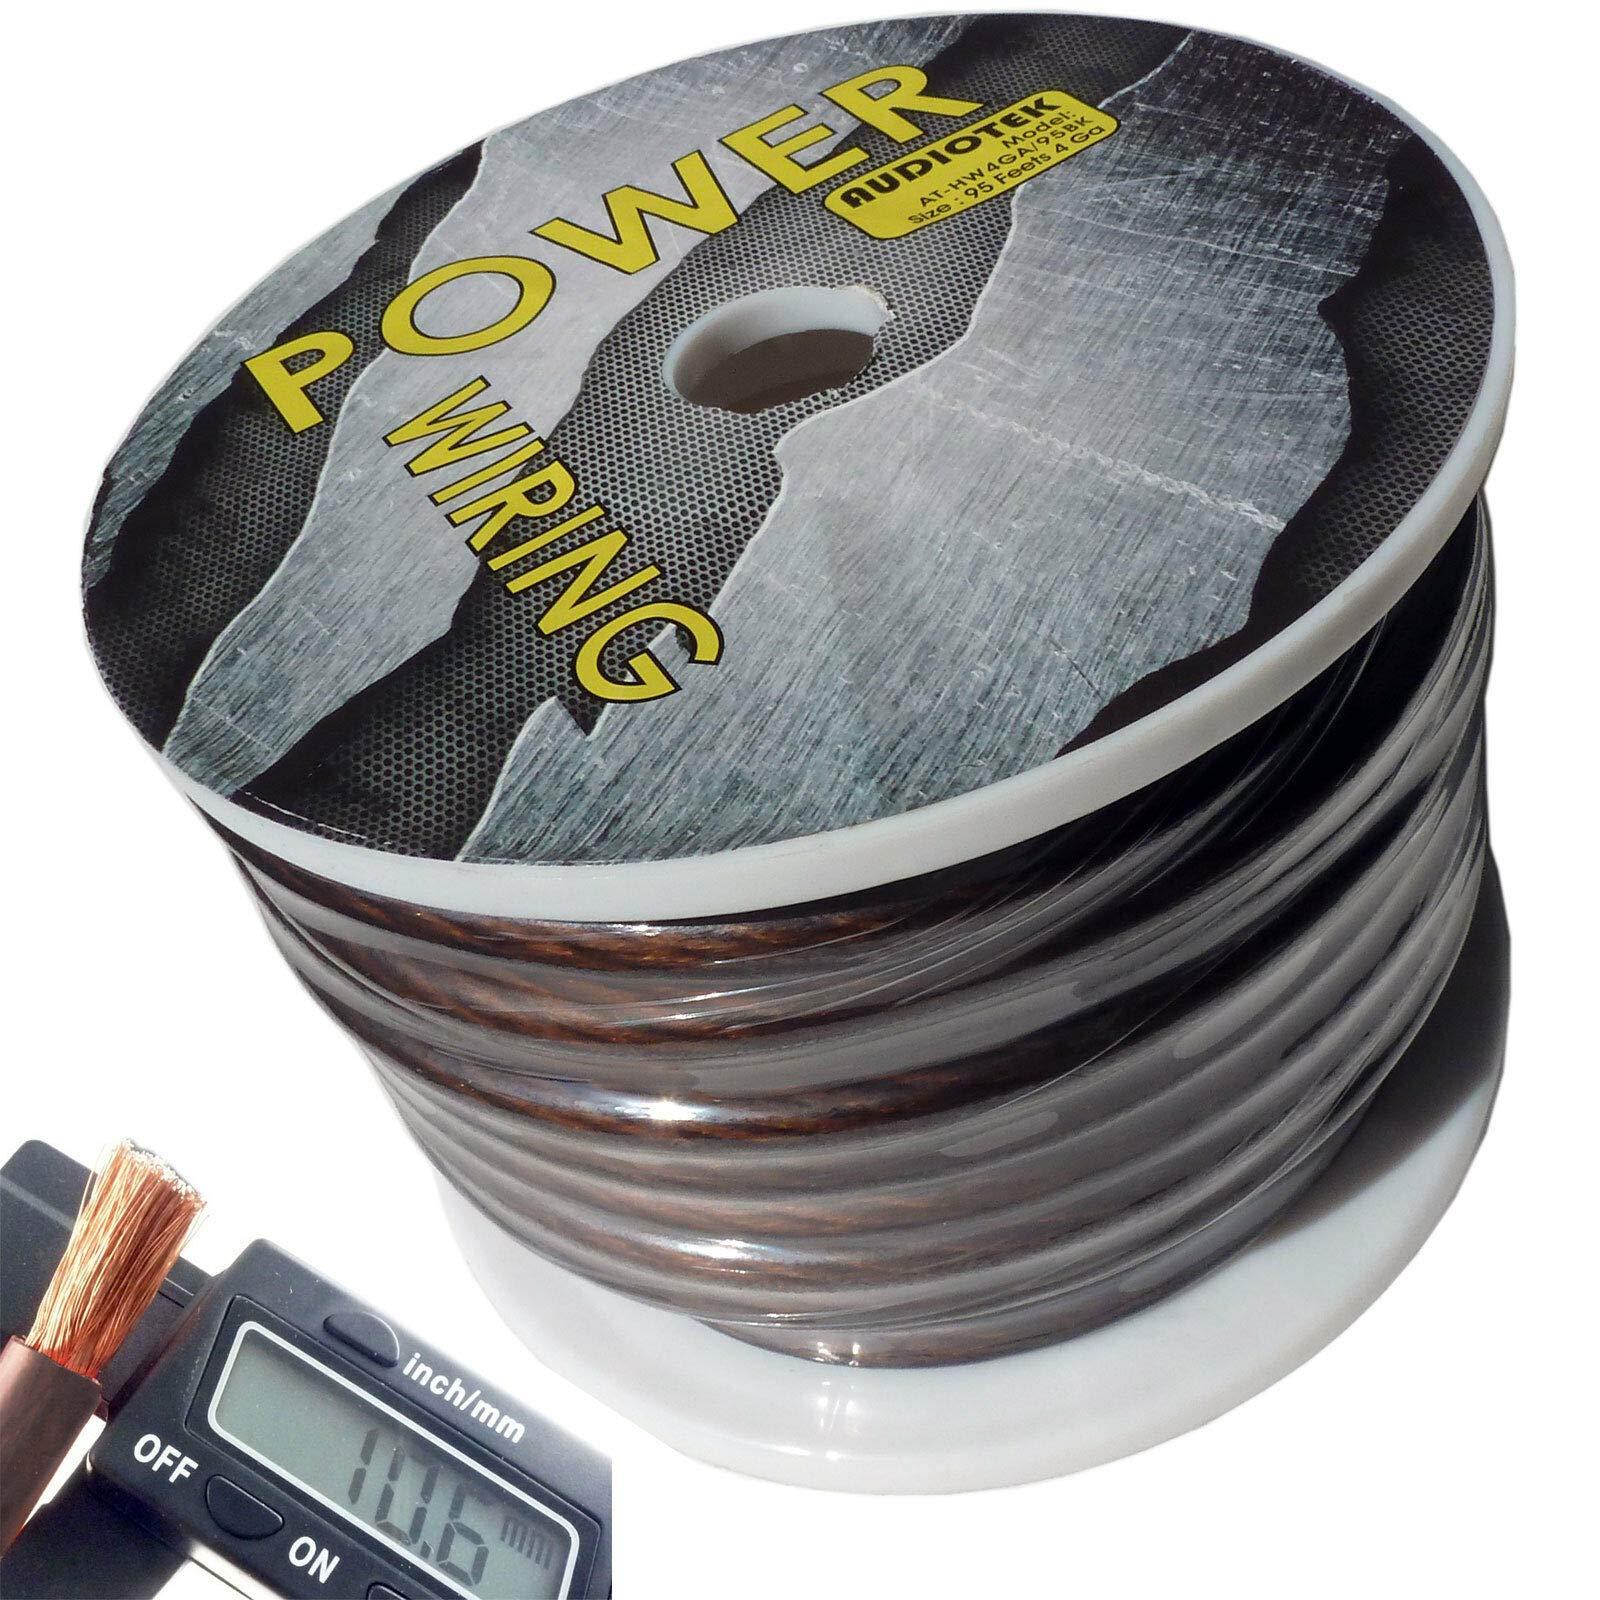 AUDIOTEK 4 Gauge Super Flexible Wire 95 FT Black ROLL Spool FEET AWG Hyperflex 95 FEET US